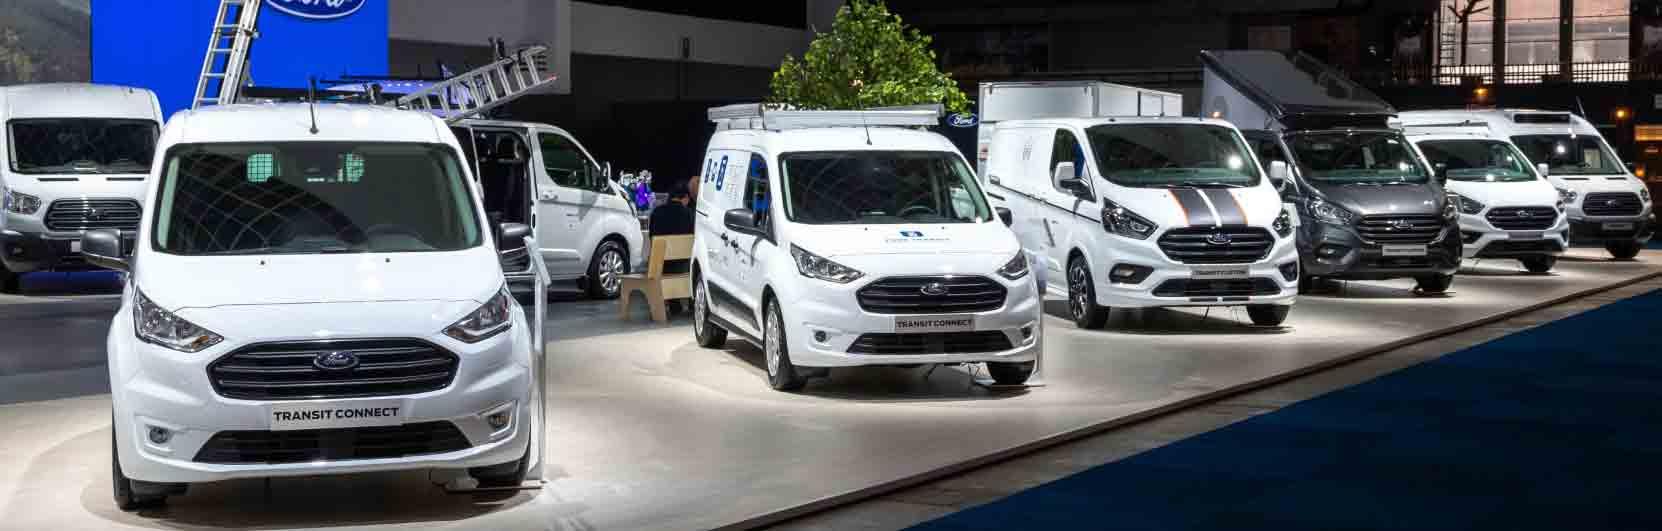 line of white vans on the showroom floor